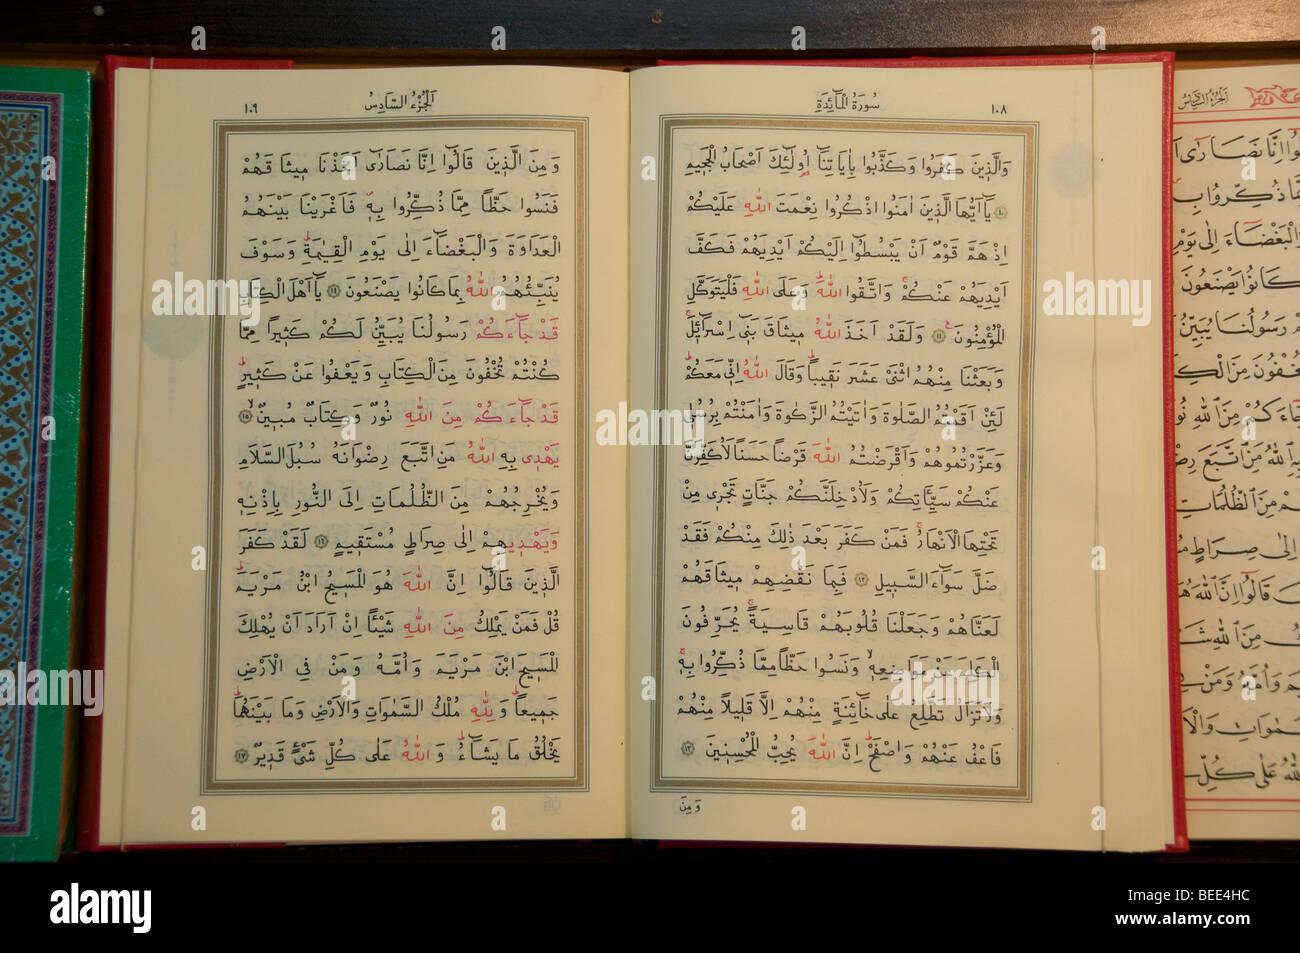 Istanbul bookshop bookstore Koran Muslim Islam Islamic - Stock Image